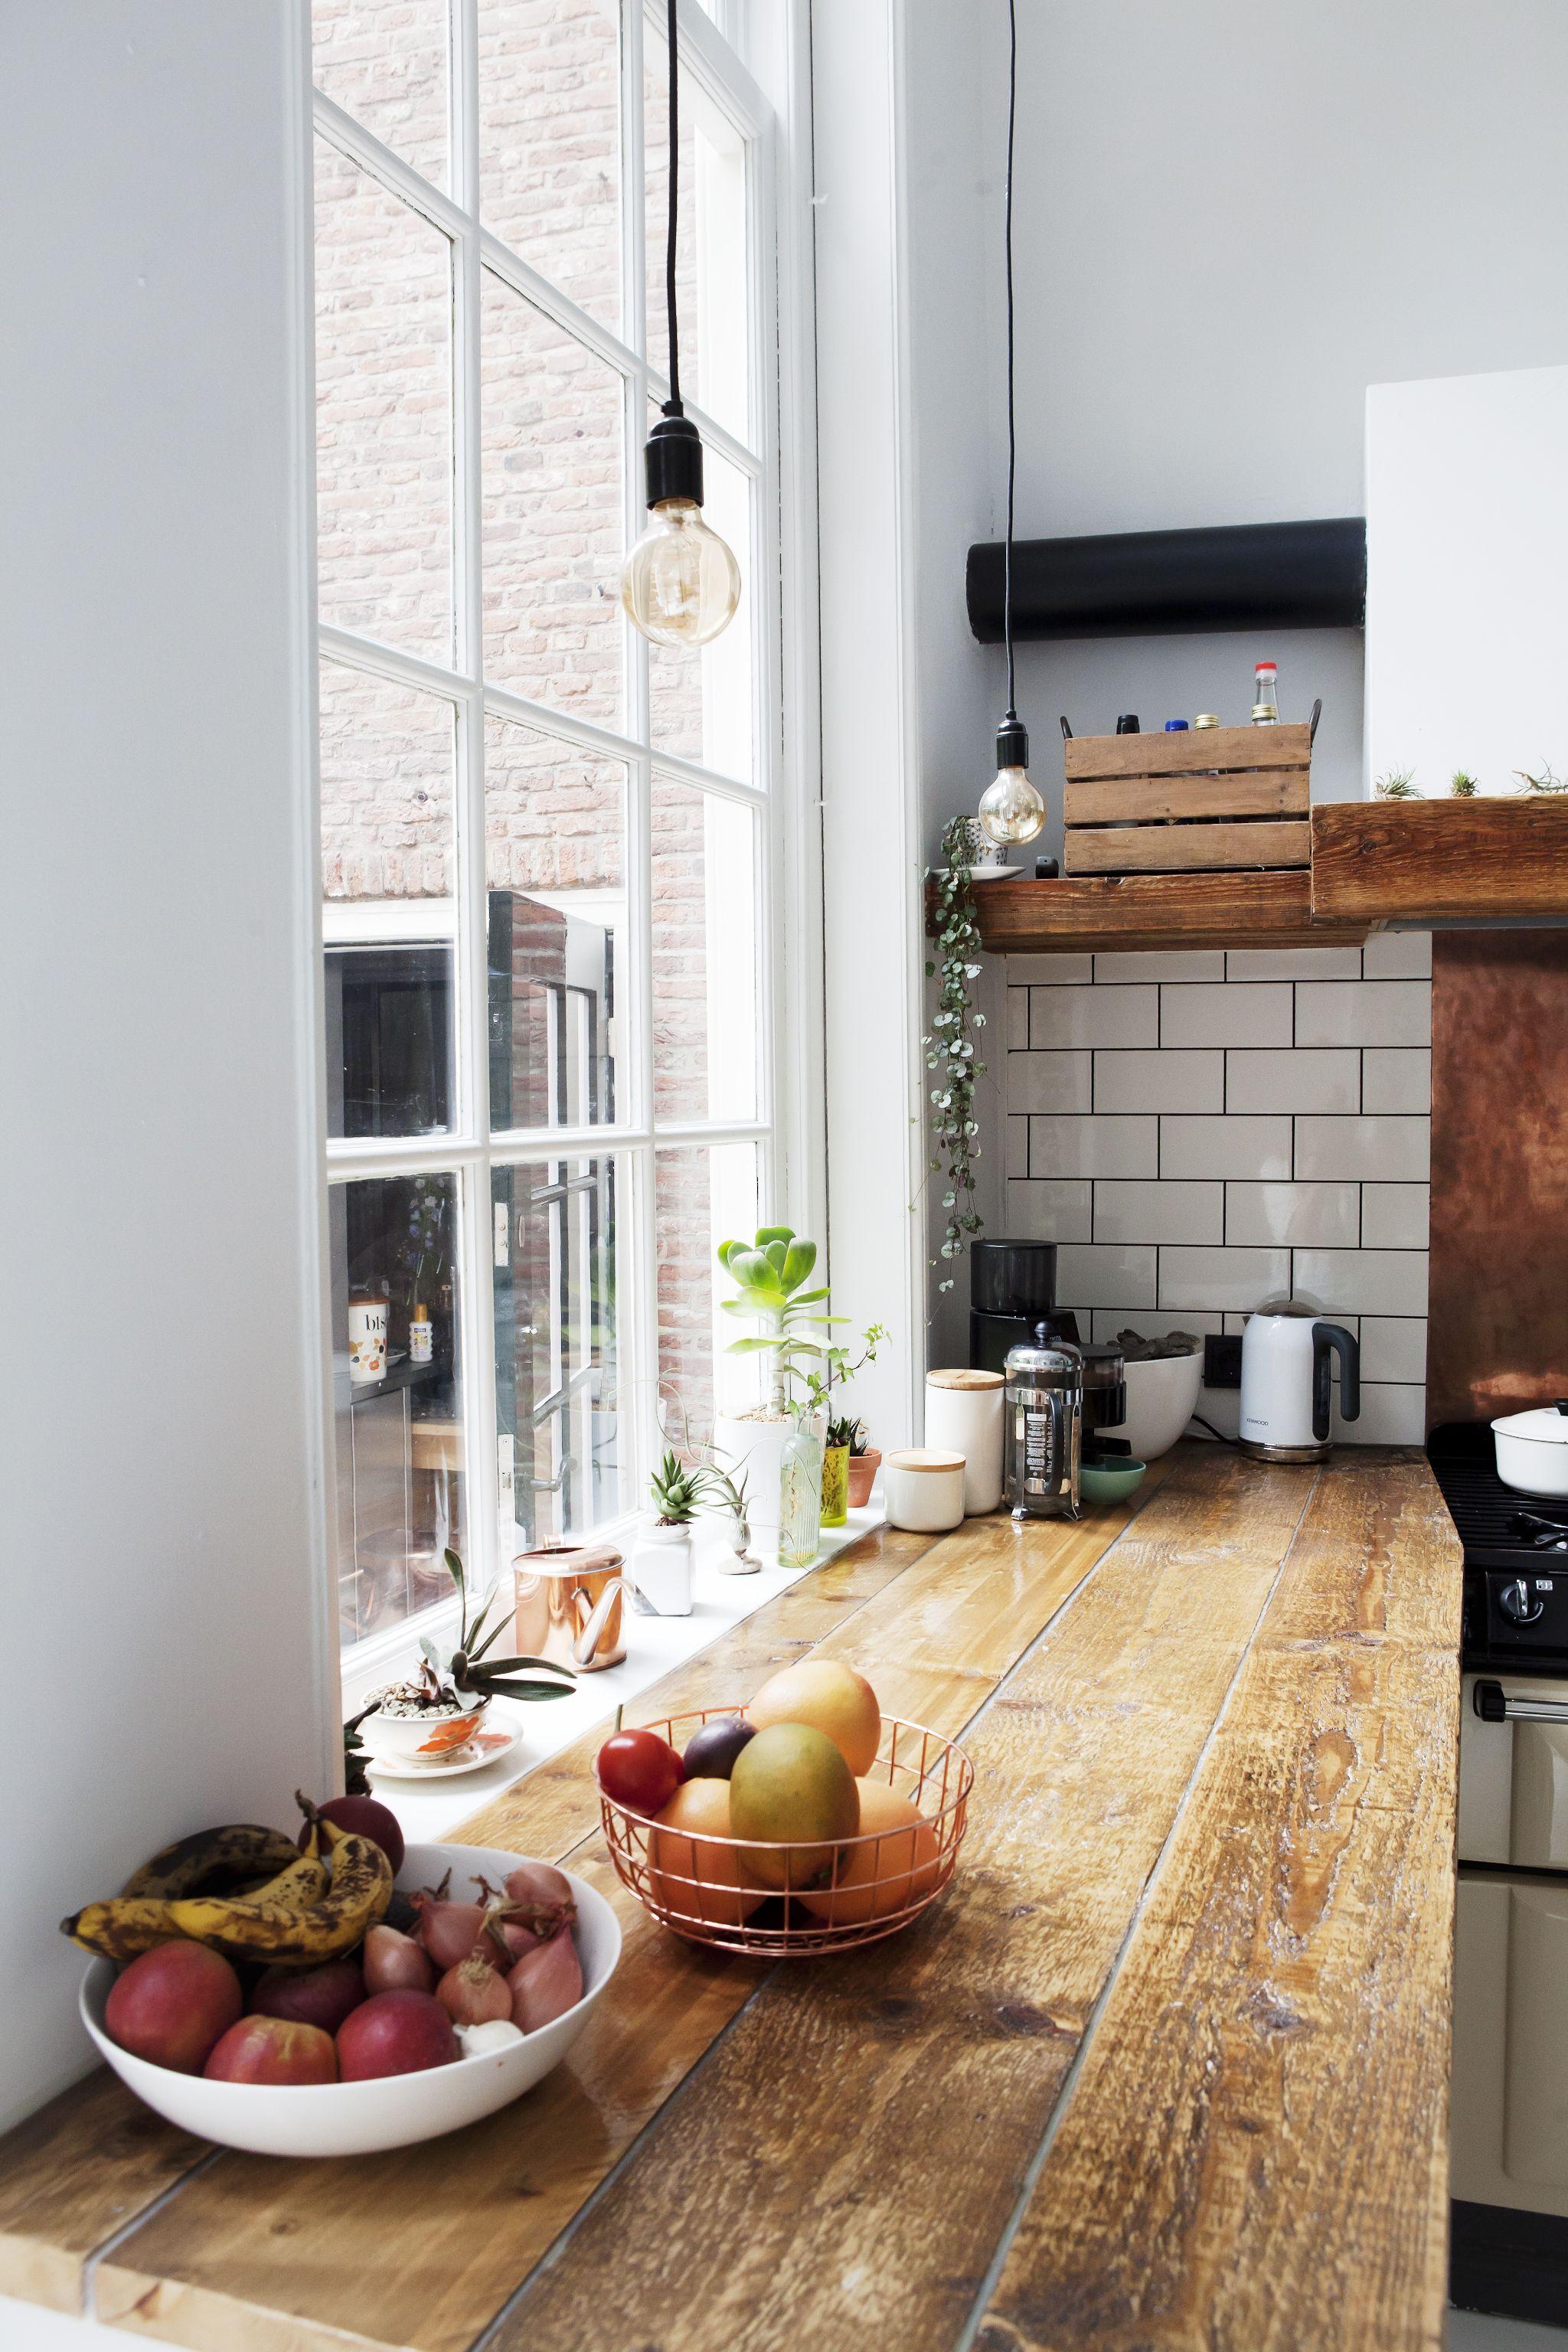 Sunny Kitchen With Butcher Block Countertops Kuchenarbeitsplatte Kuchenumbau Holzkuche